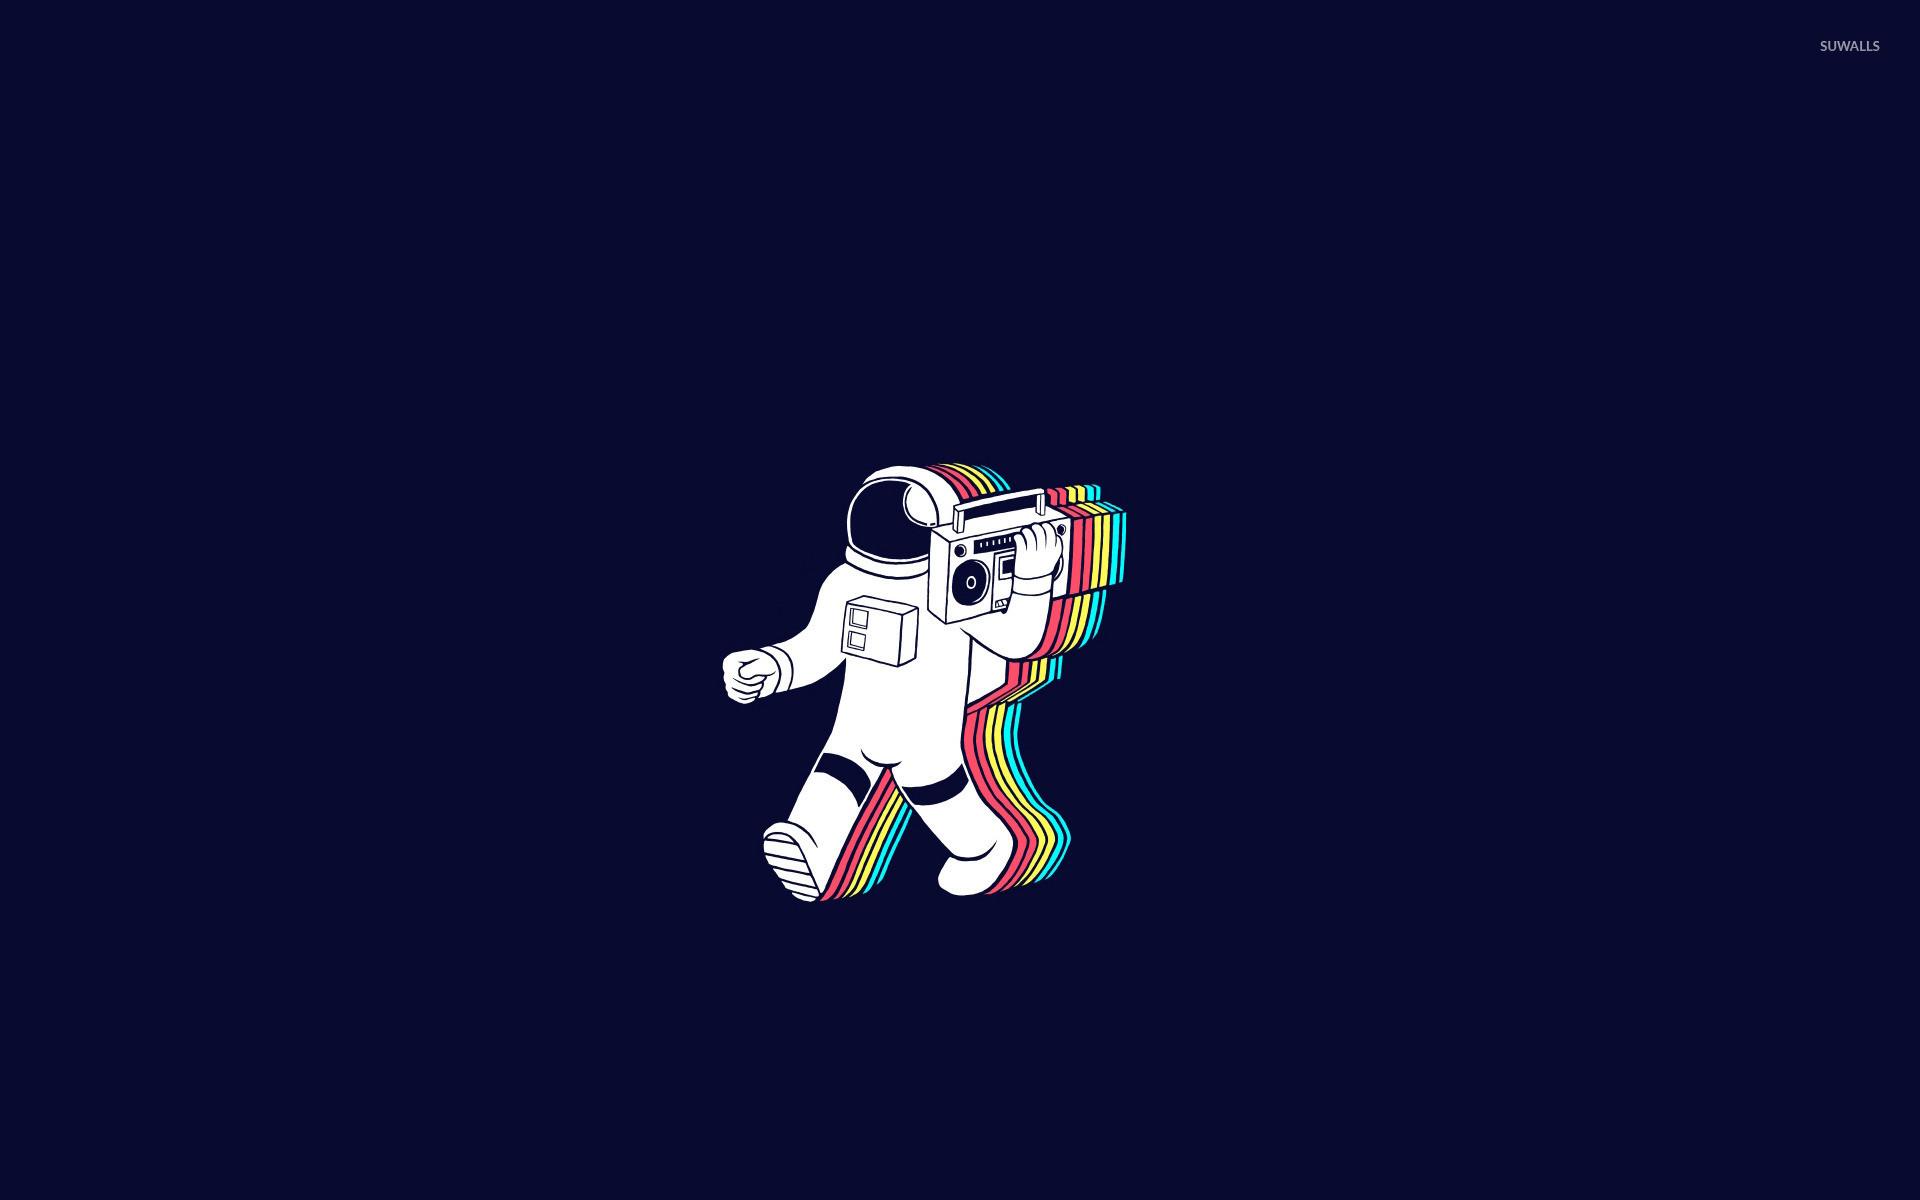 Party astronaut wallpaper jpg